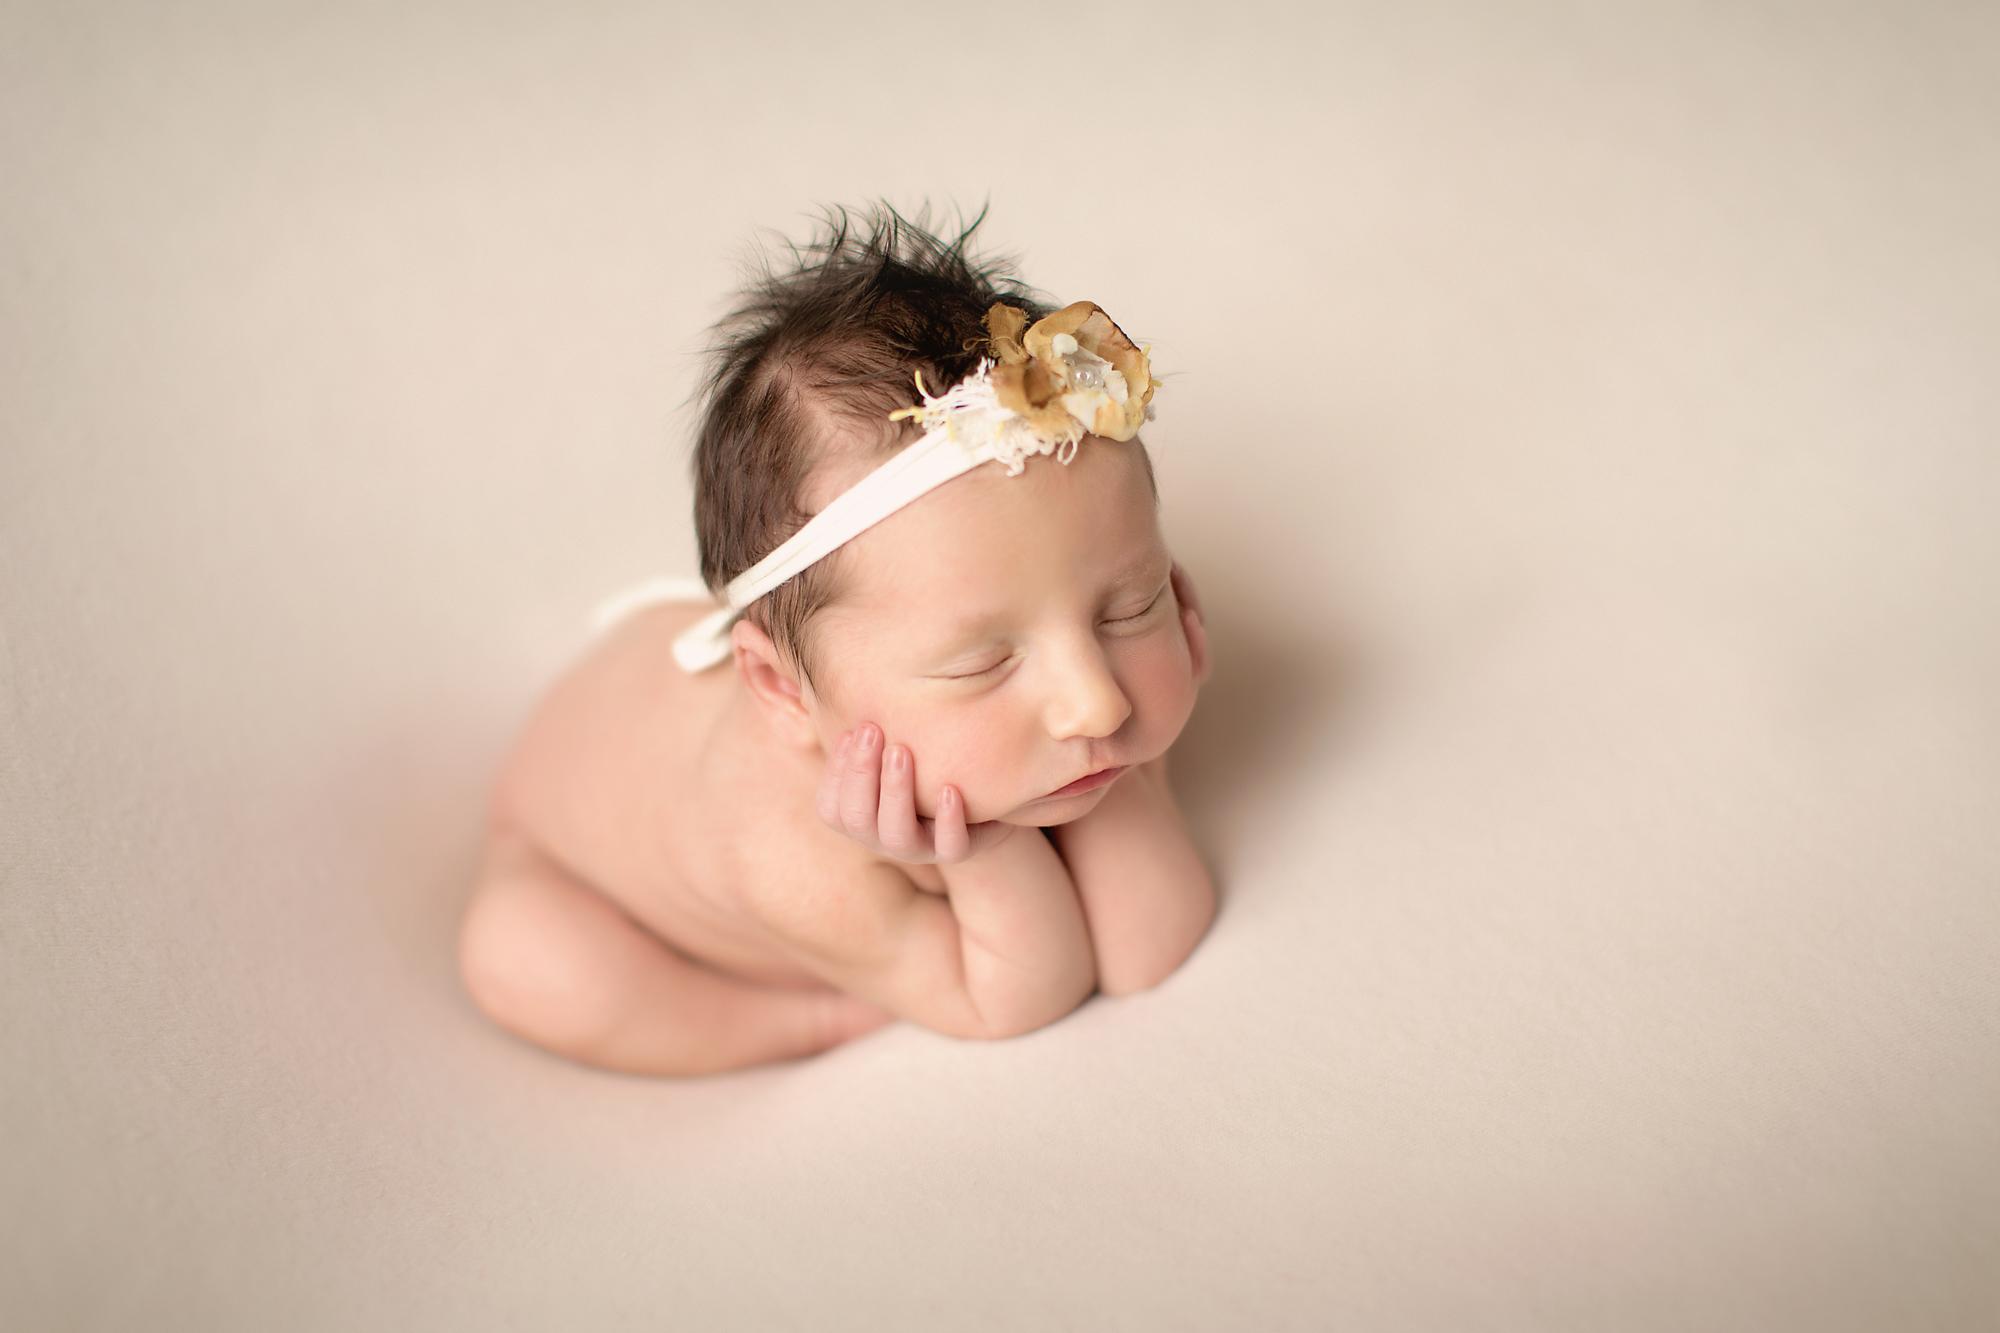 Side froggy pose - newborn baby girl. Newborn Photoshoot ideas. Calgary and Airdrie newborn baby photographer - Milashka Photography